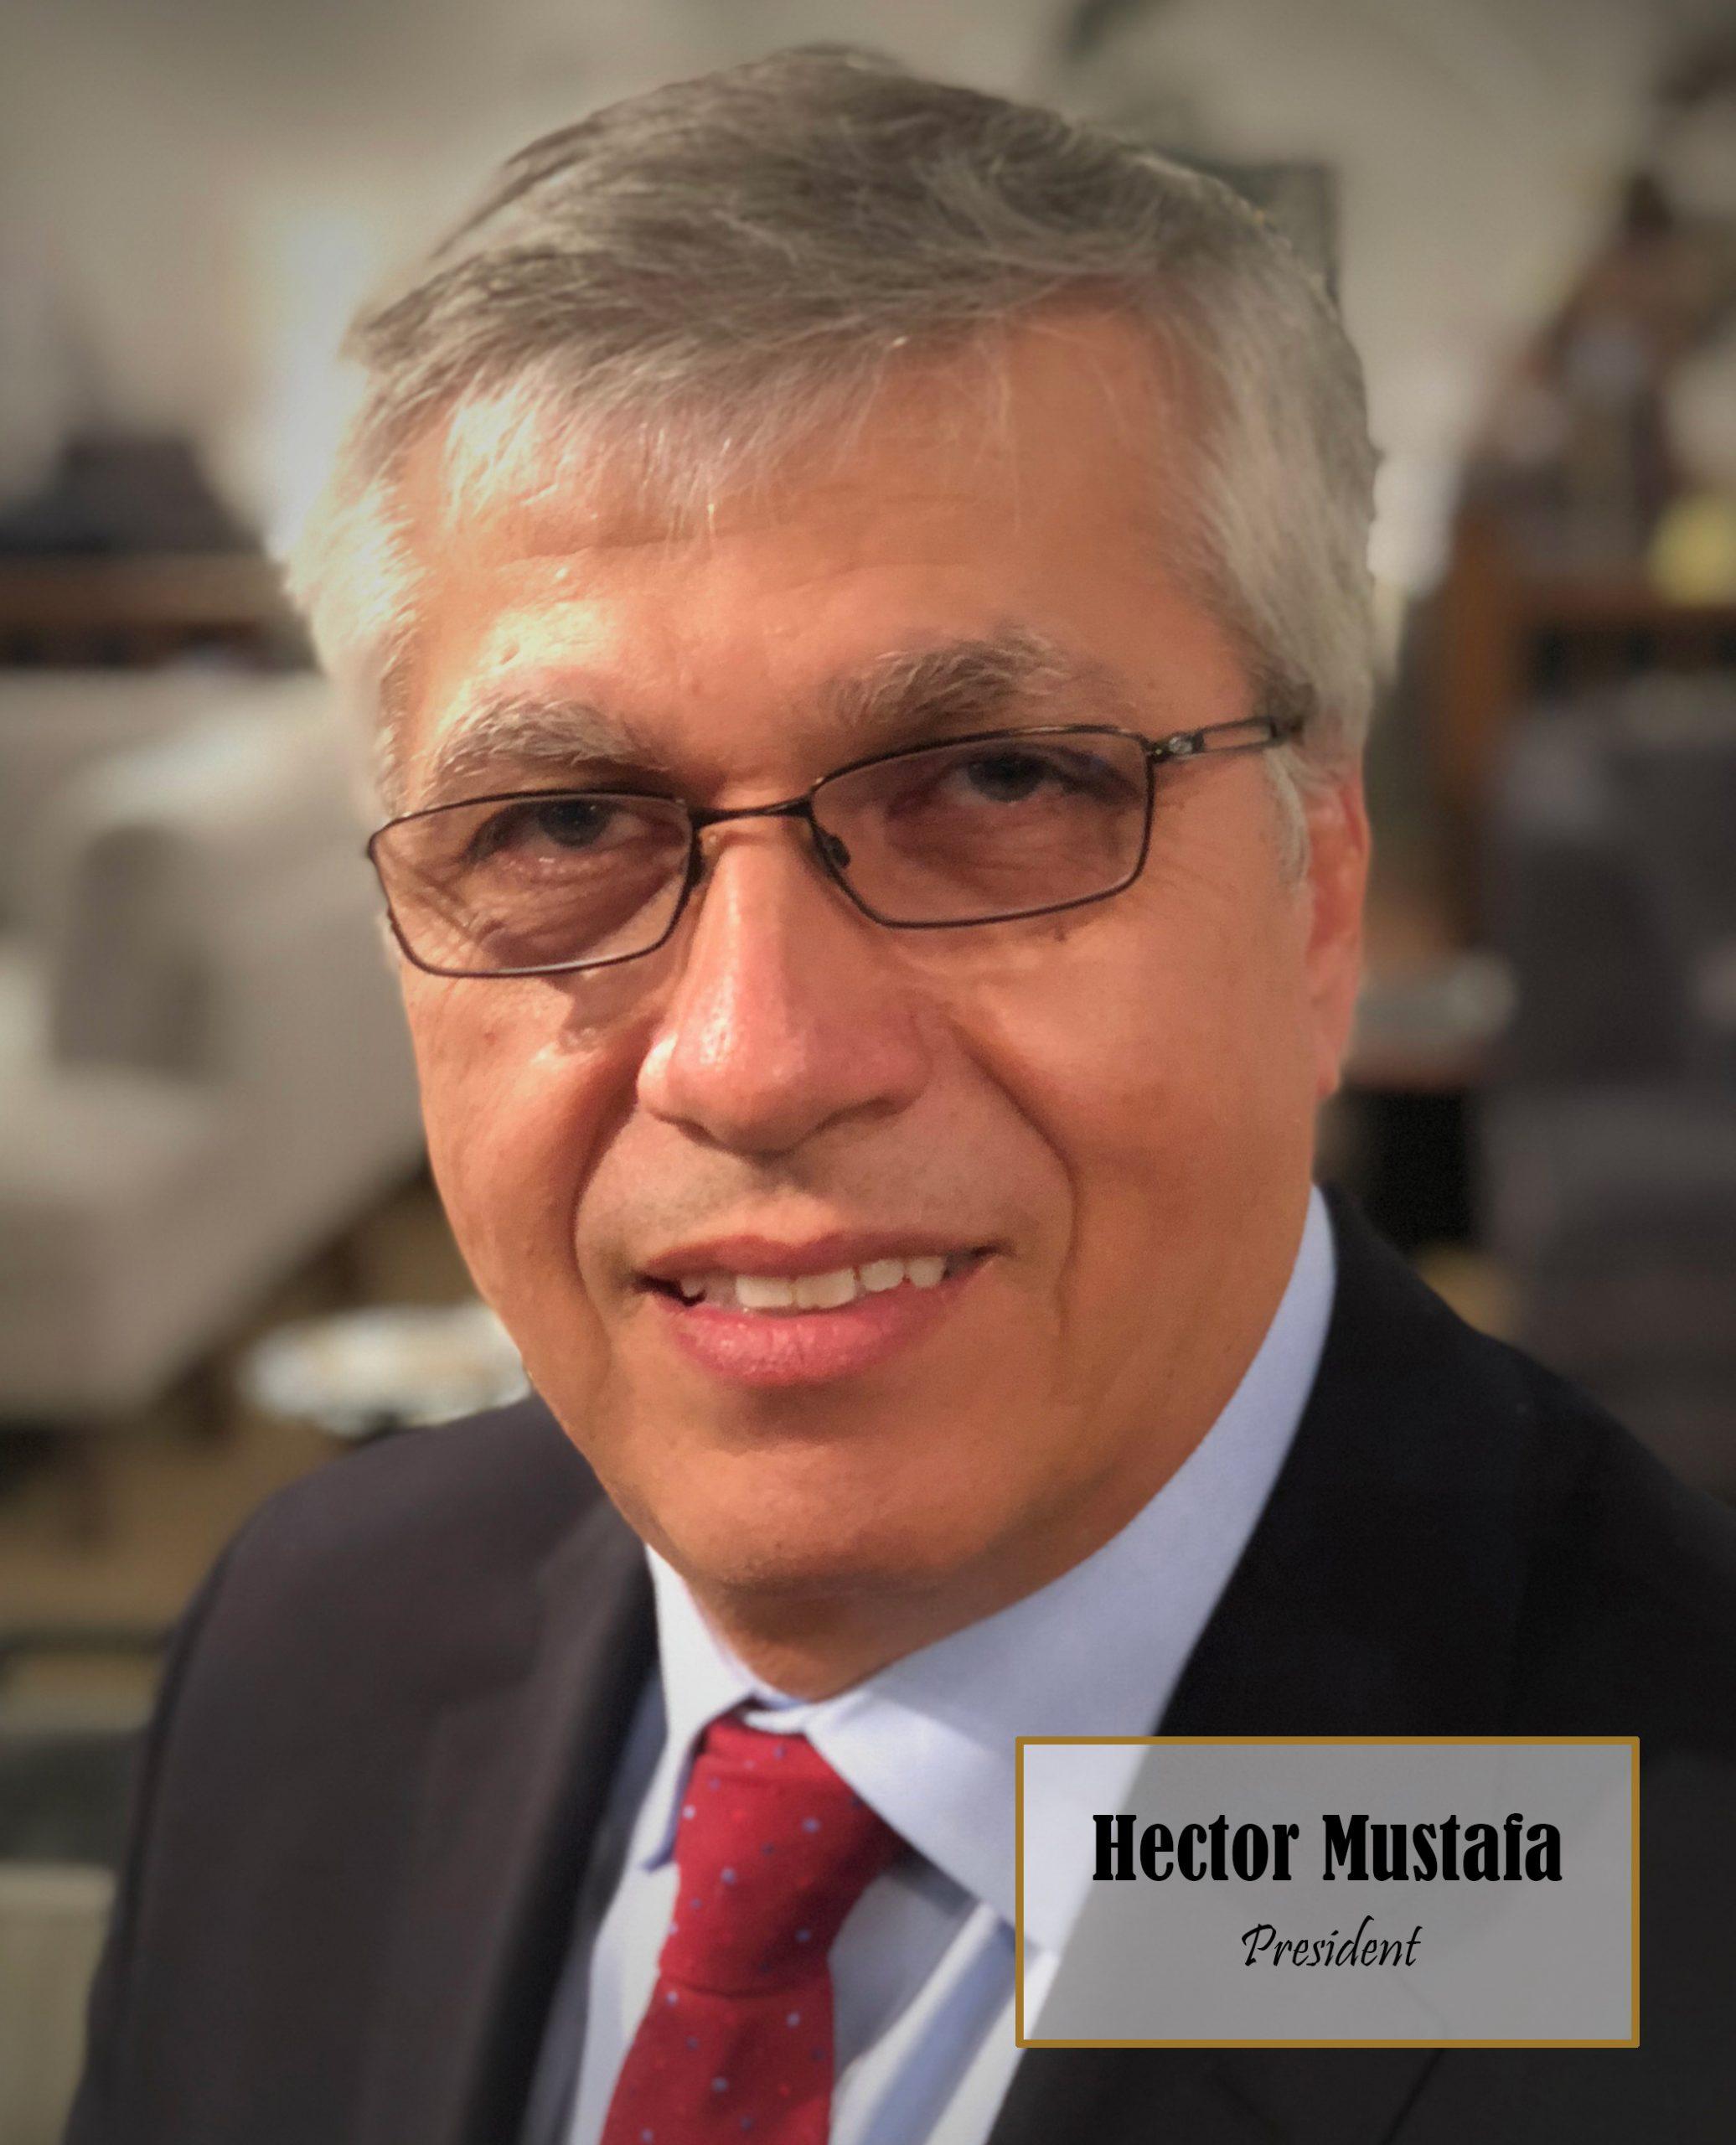 Hector Mustafa